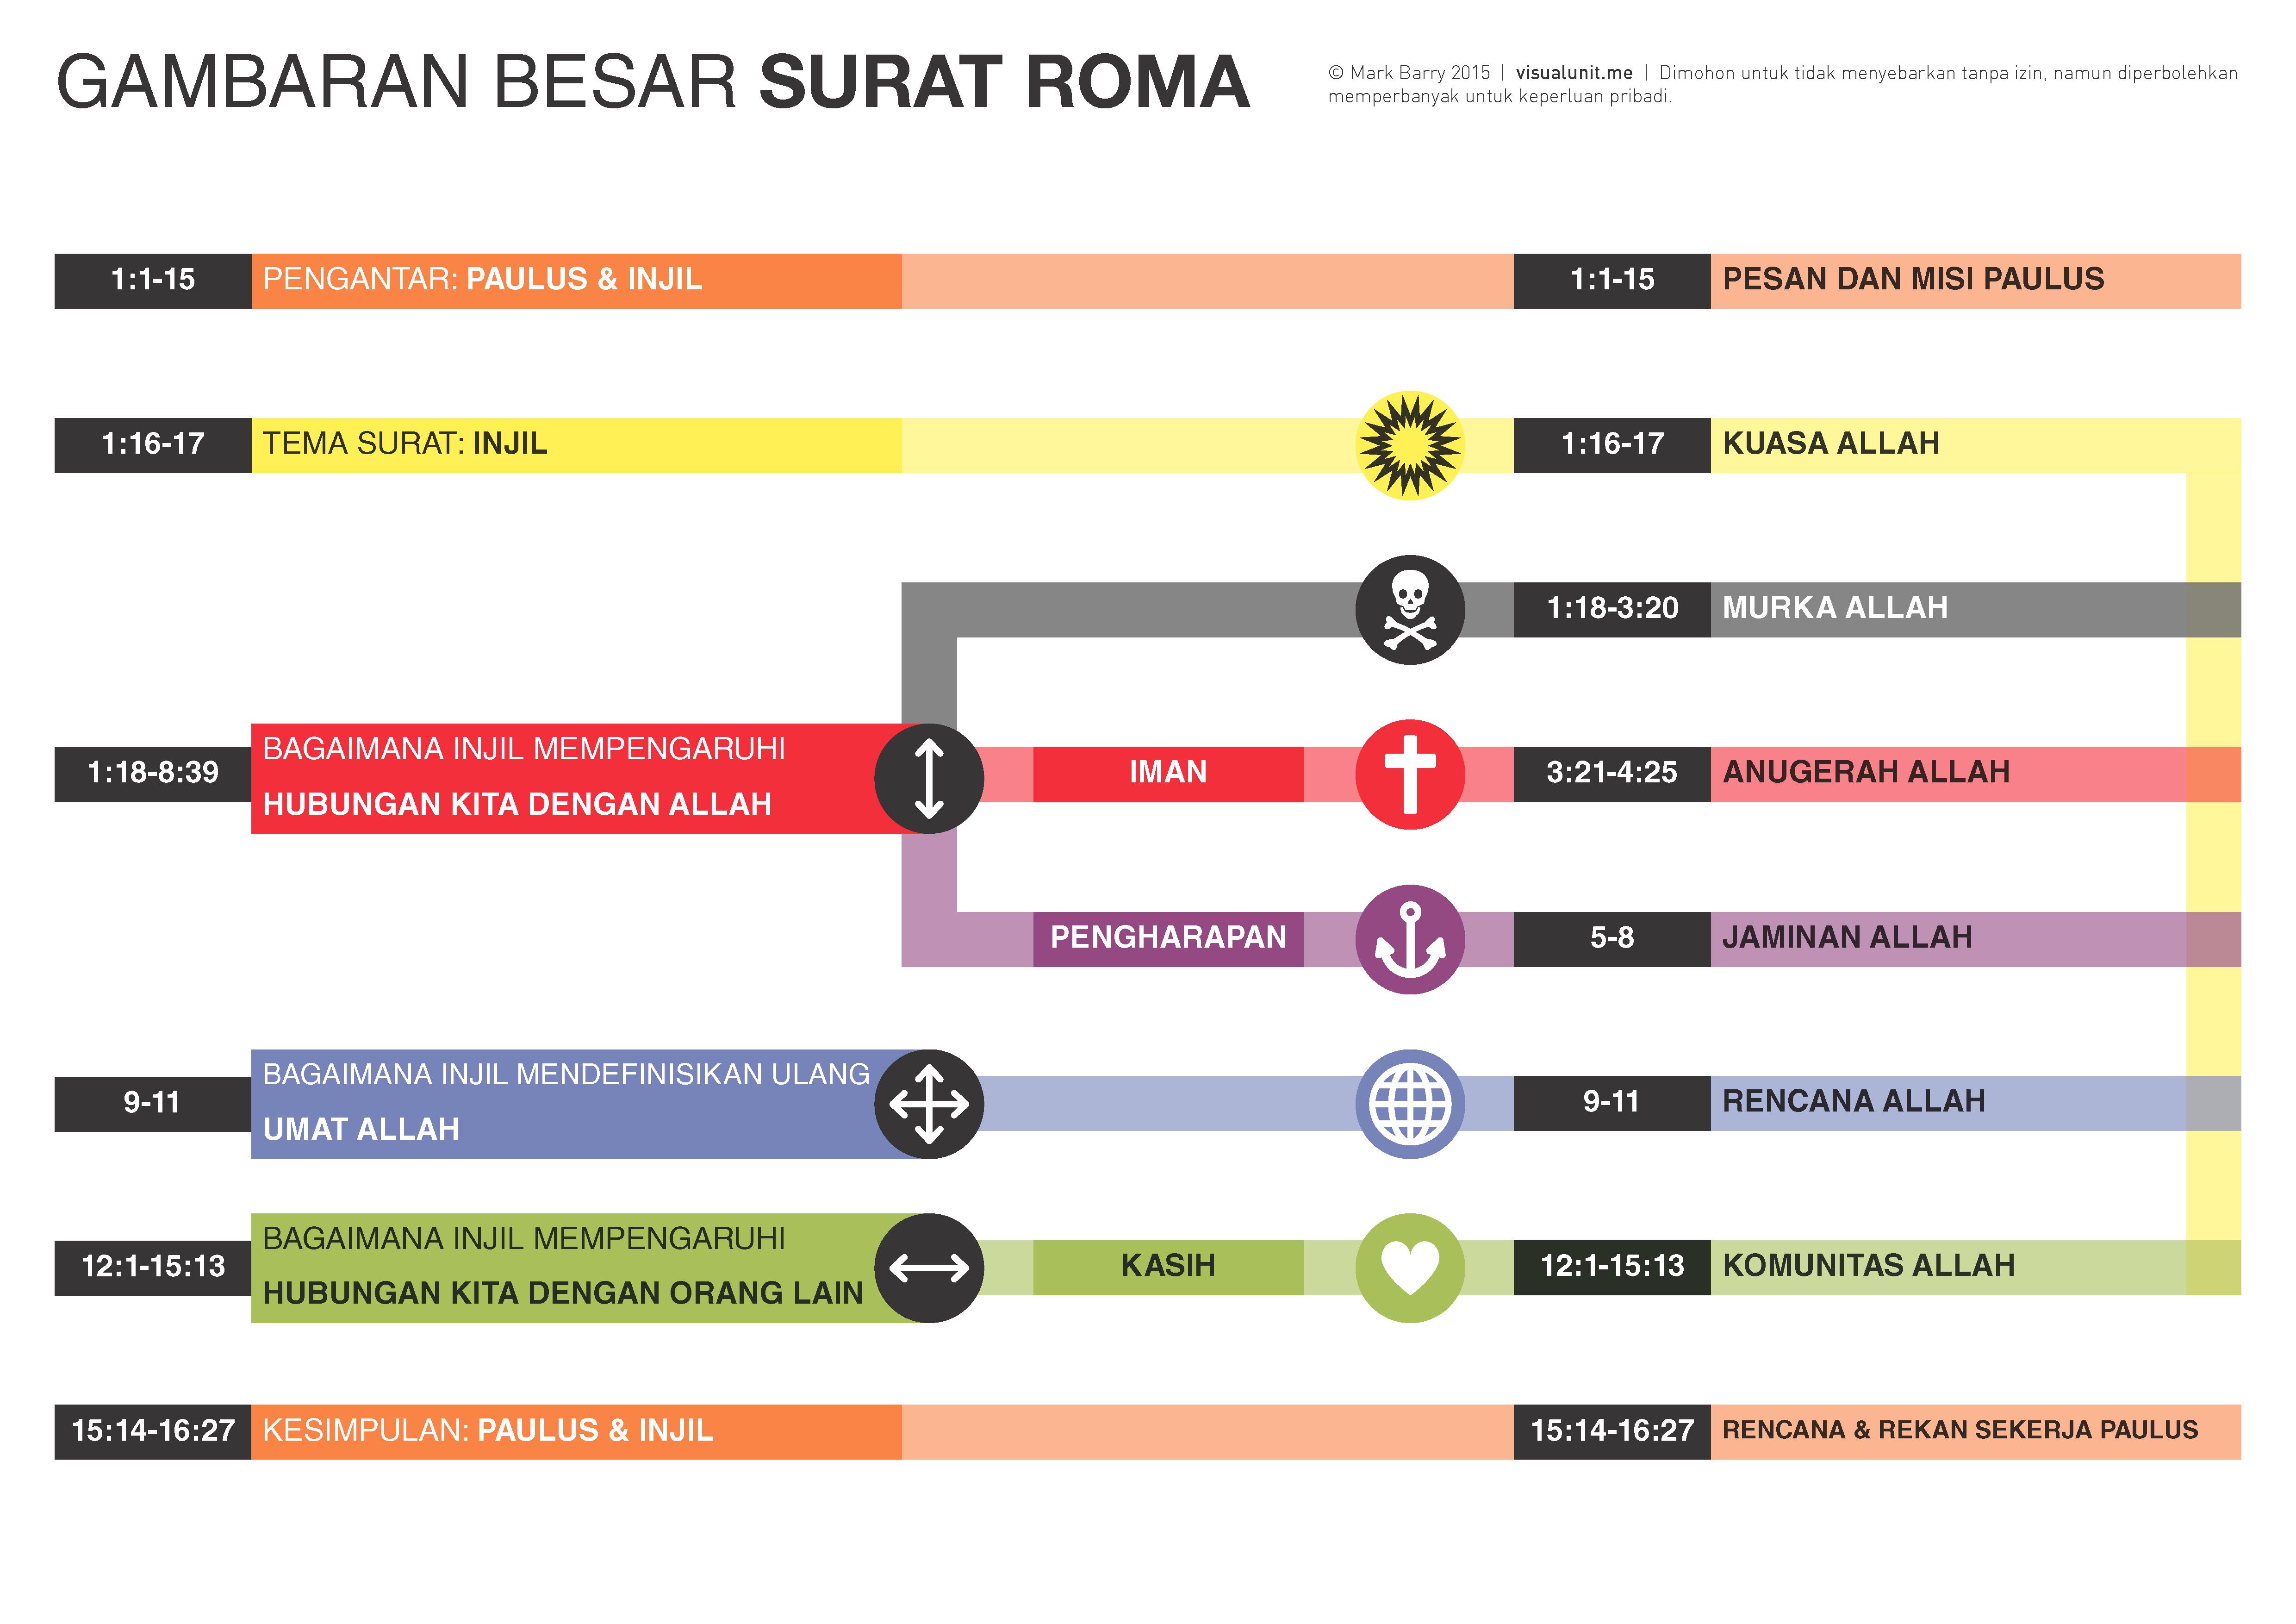 Gambaran Besar Surat Roma Indonesian Romans Big Picture